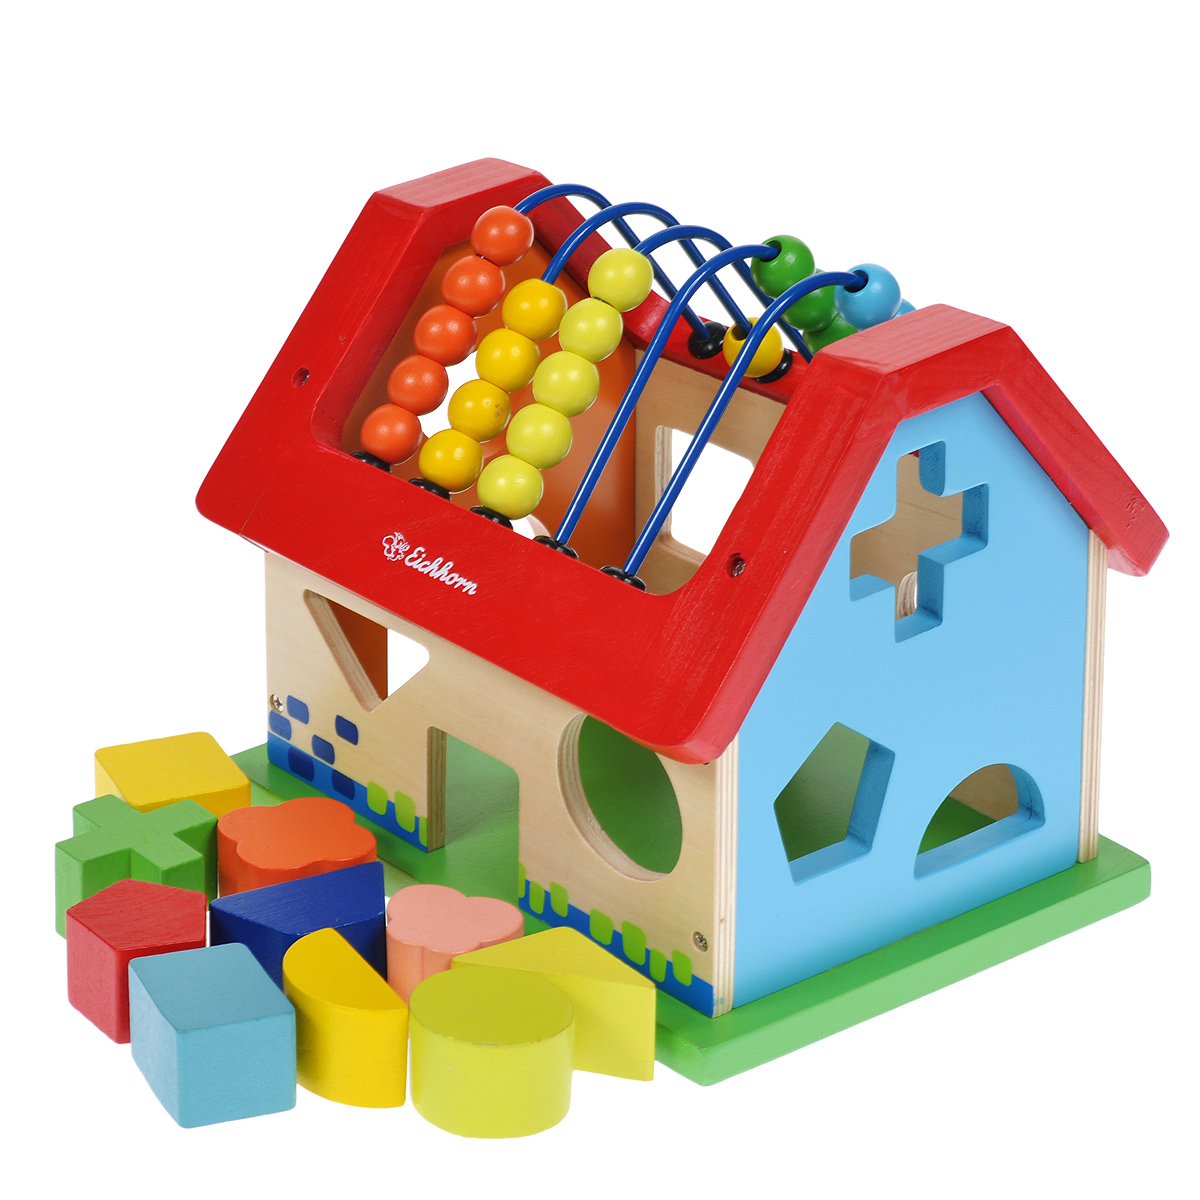 Simba Развивающая игрушка-сортер Eichhorn Домик s&a style w15080796300